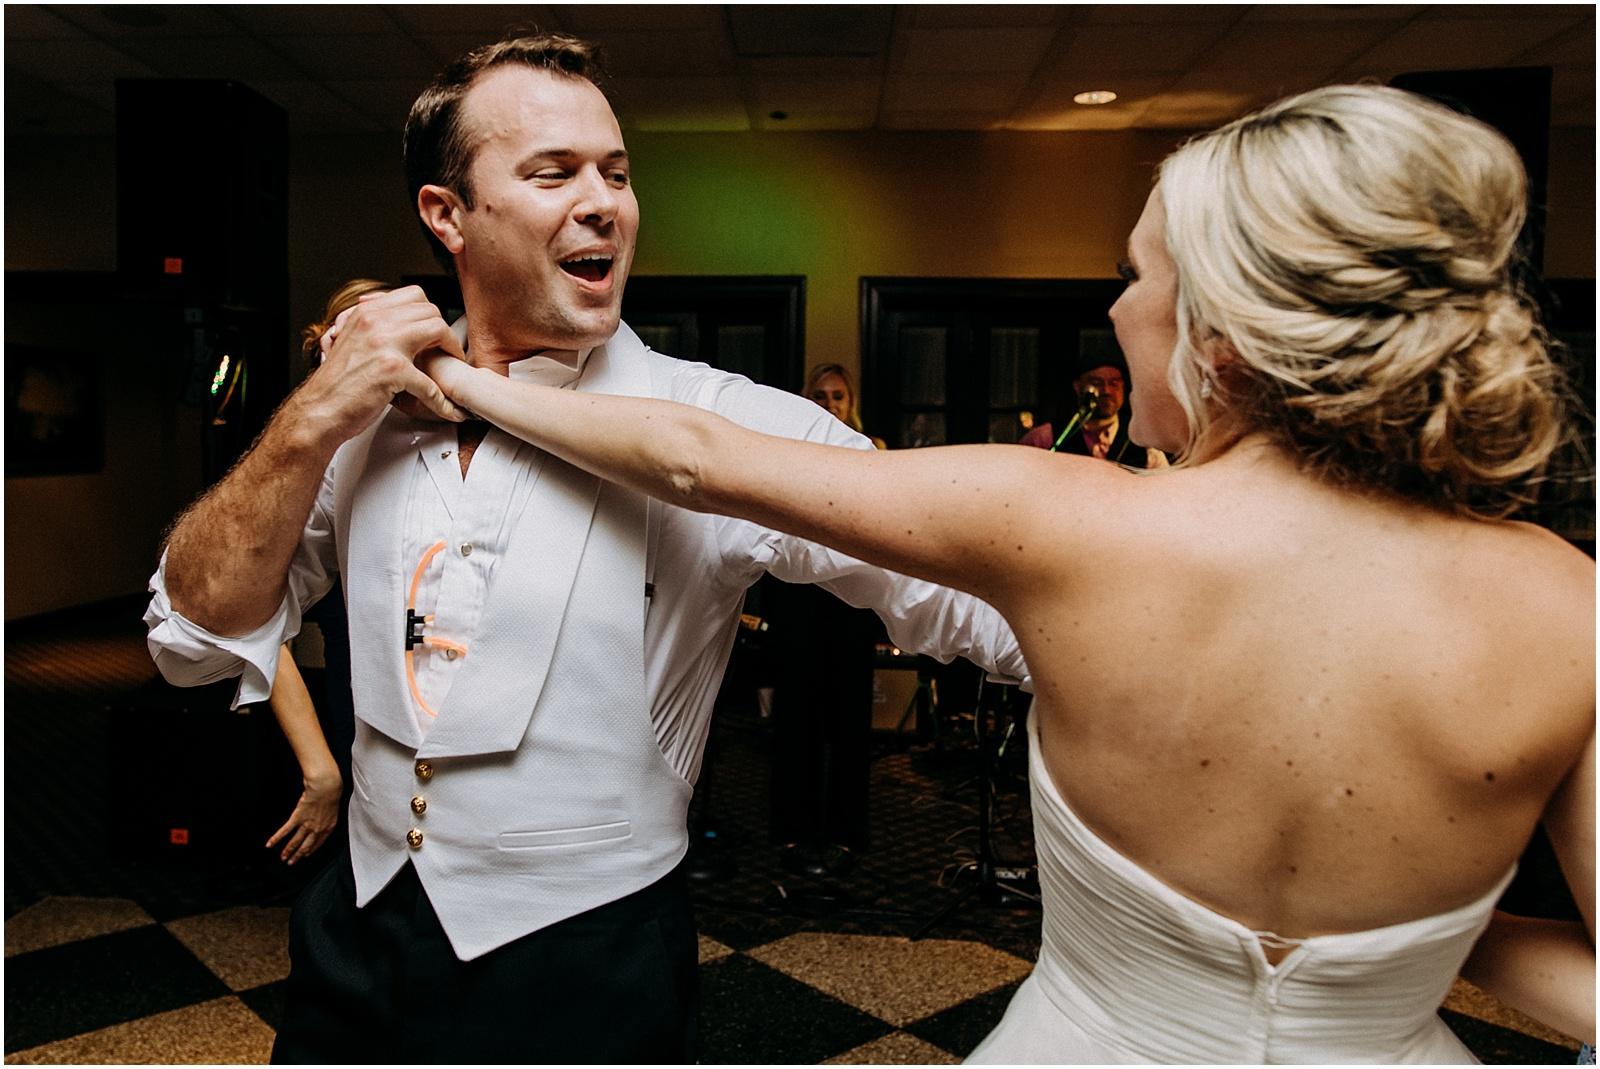 glen_echo_st_louis_mo_wedding_0154.jpg